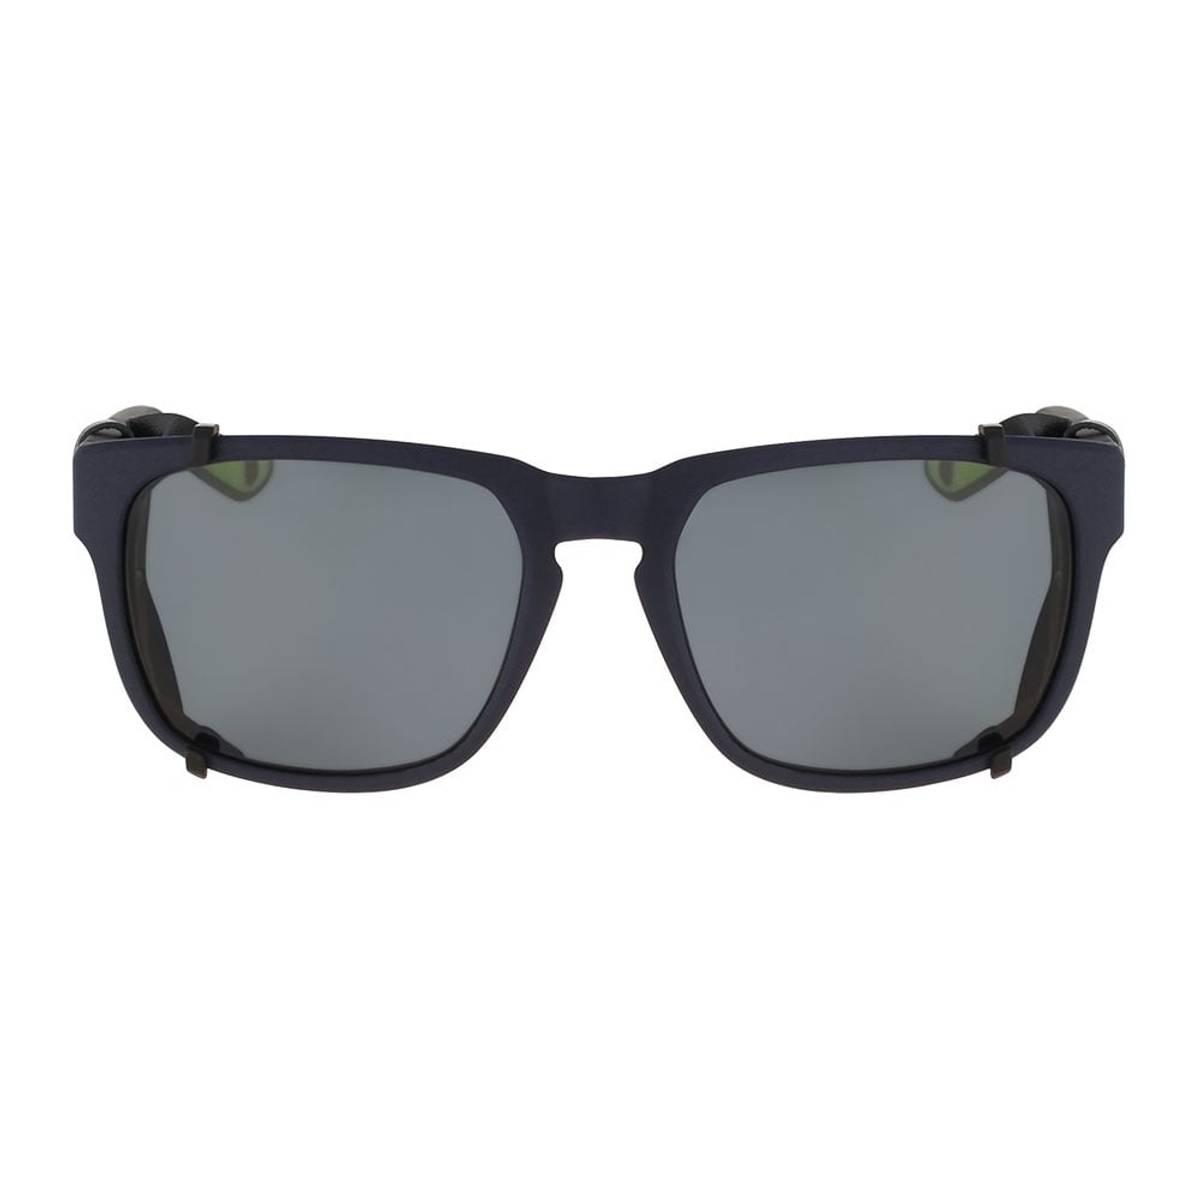 Dragon Mountaineer X Sunglasses Matte Black/Grey